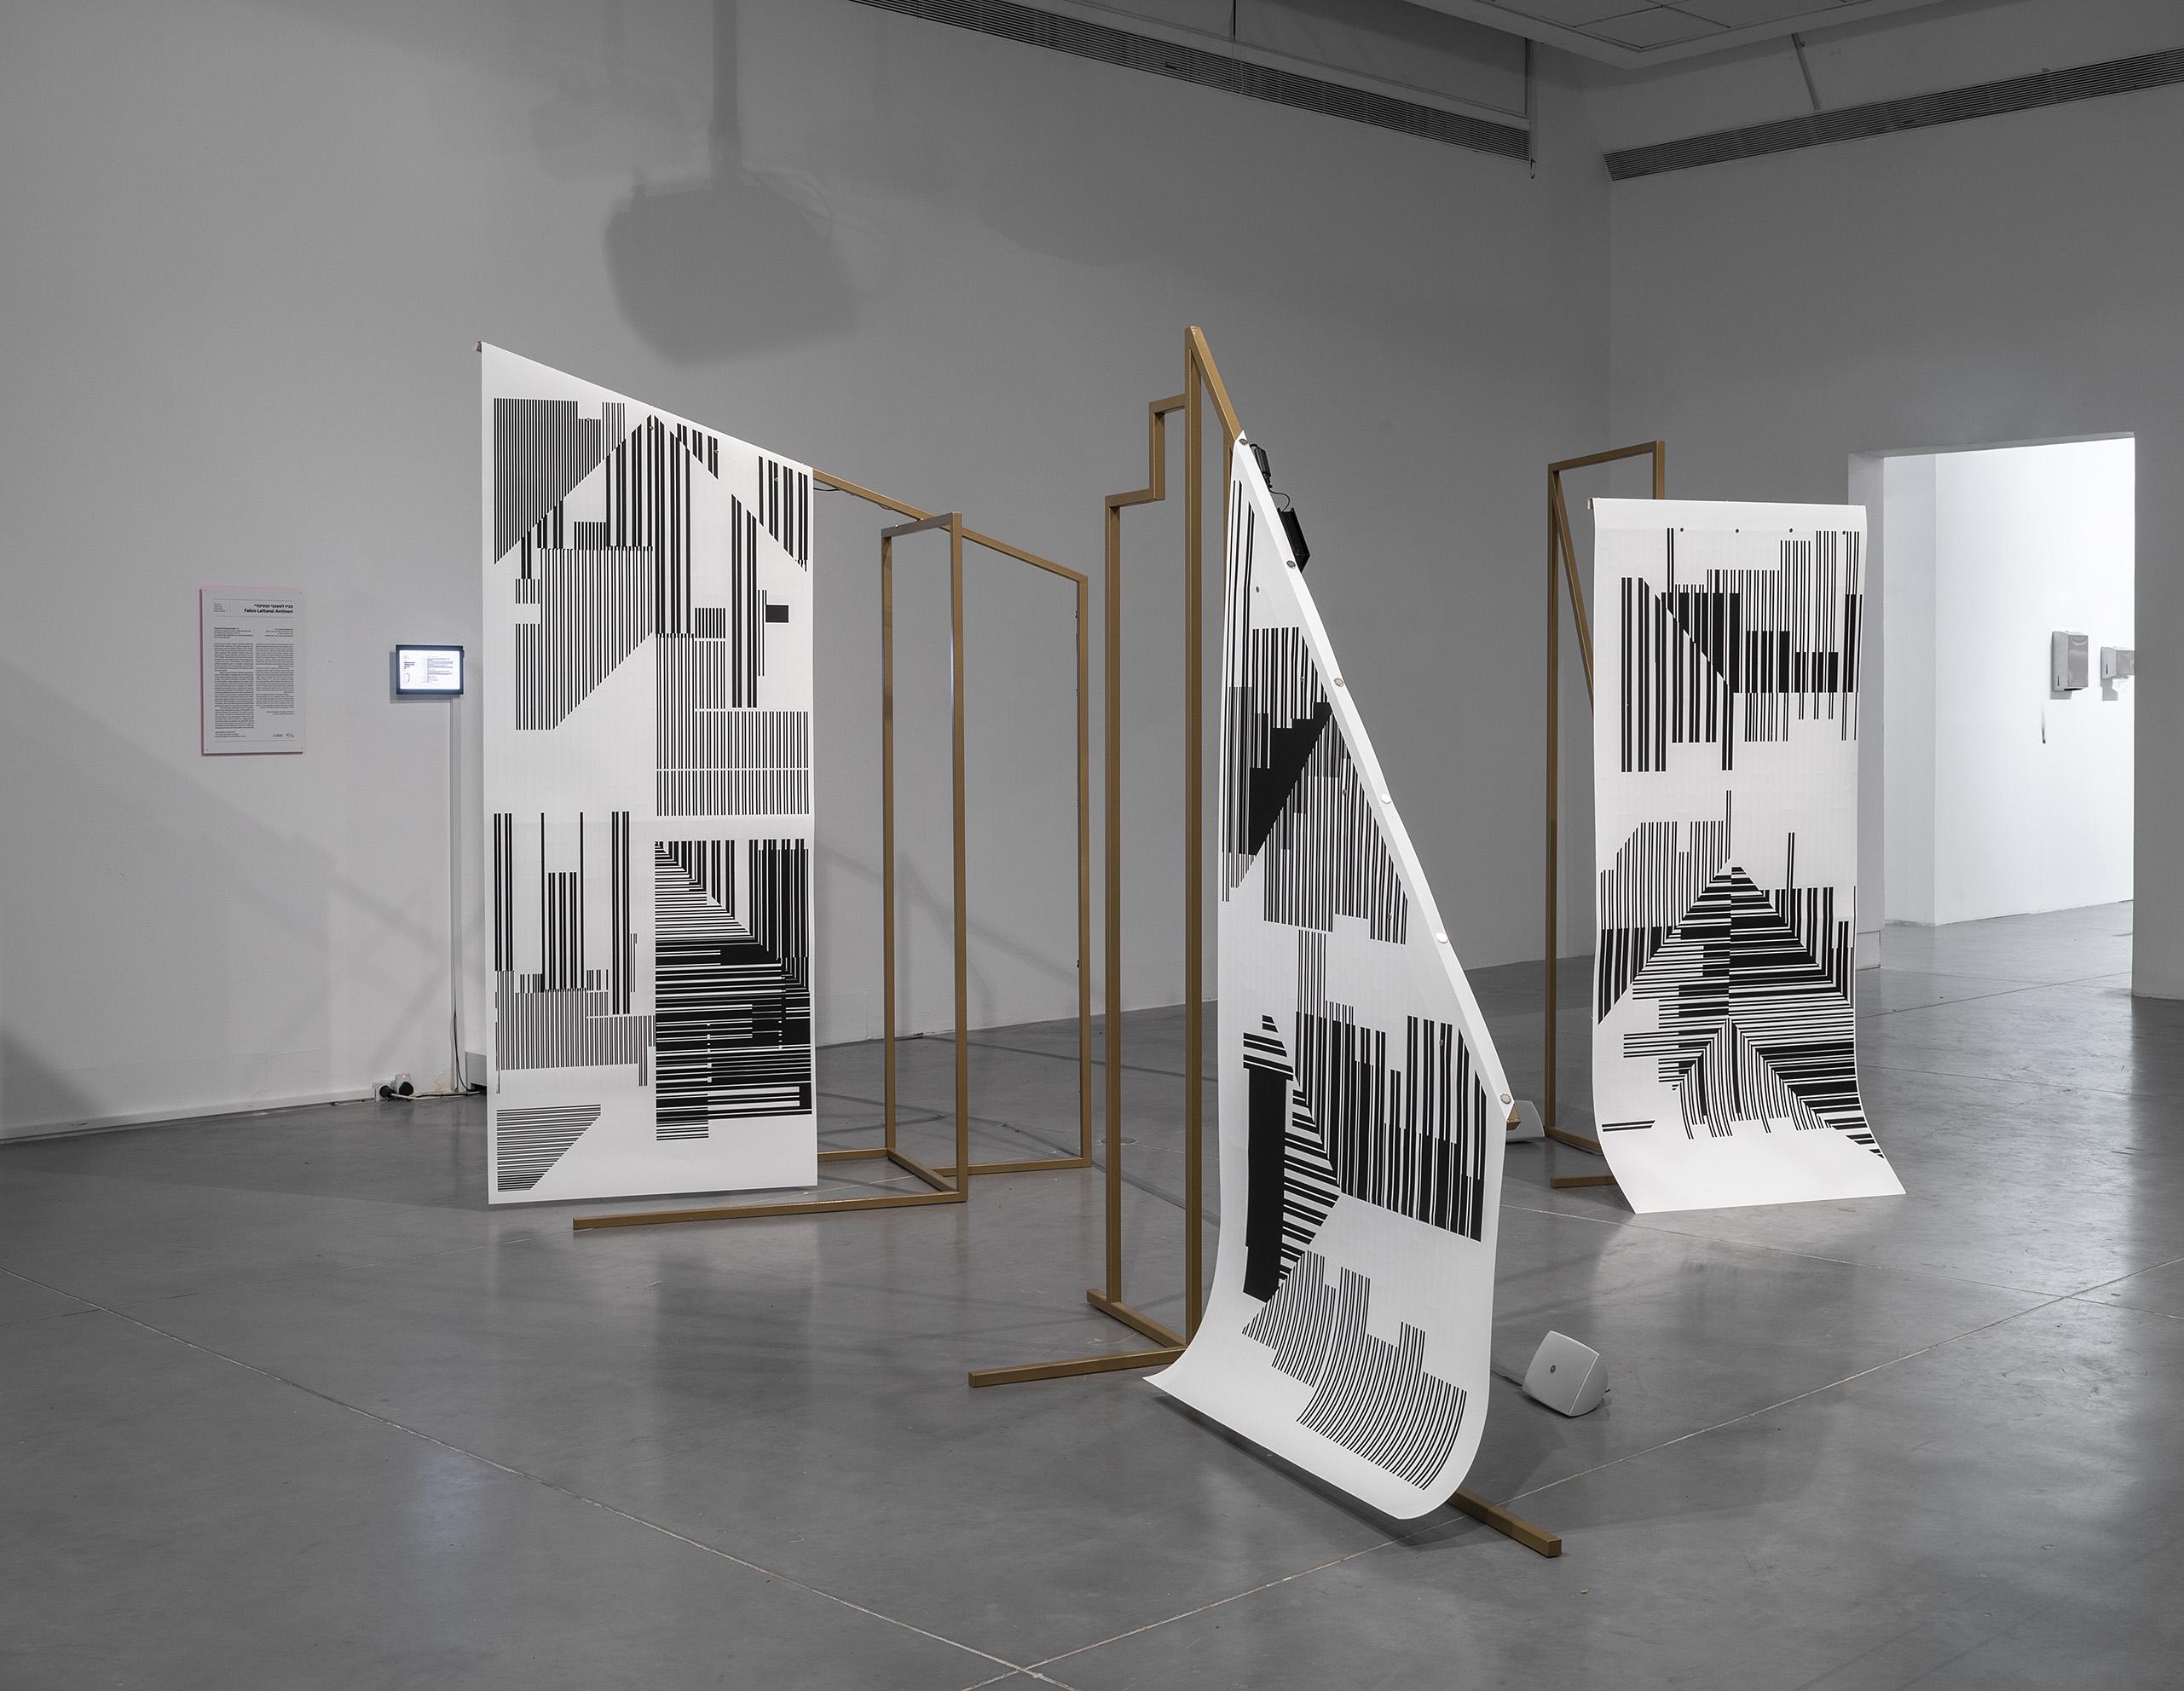 Temporarily Enslaved Gods, by Fabio Lattanzi Antinori, installation View at the Petach Tikva Museum